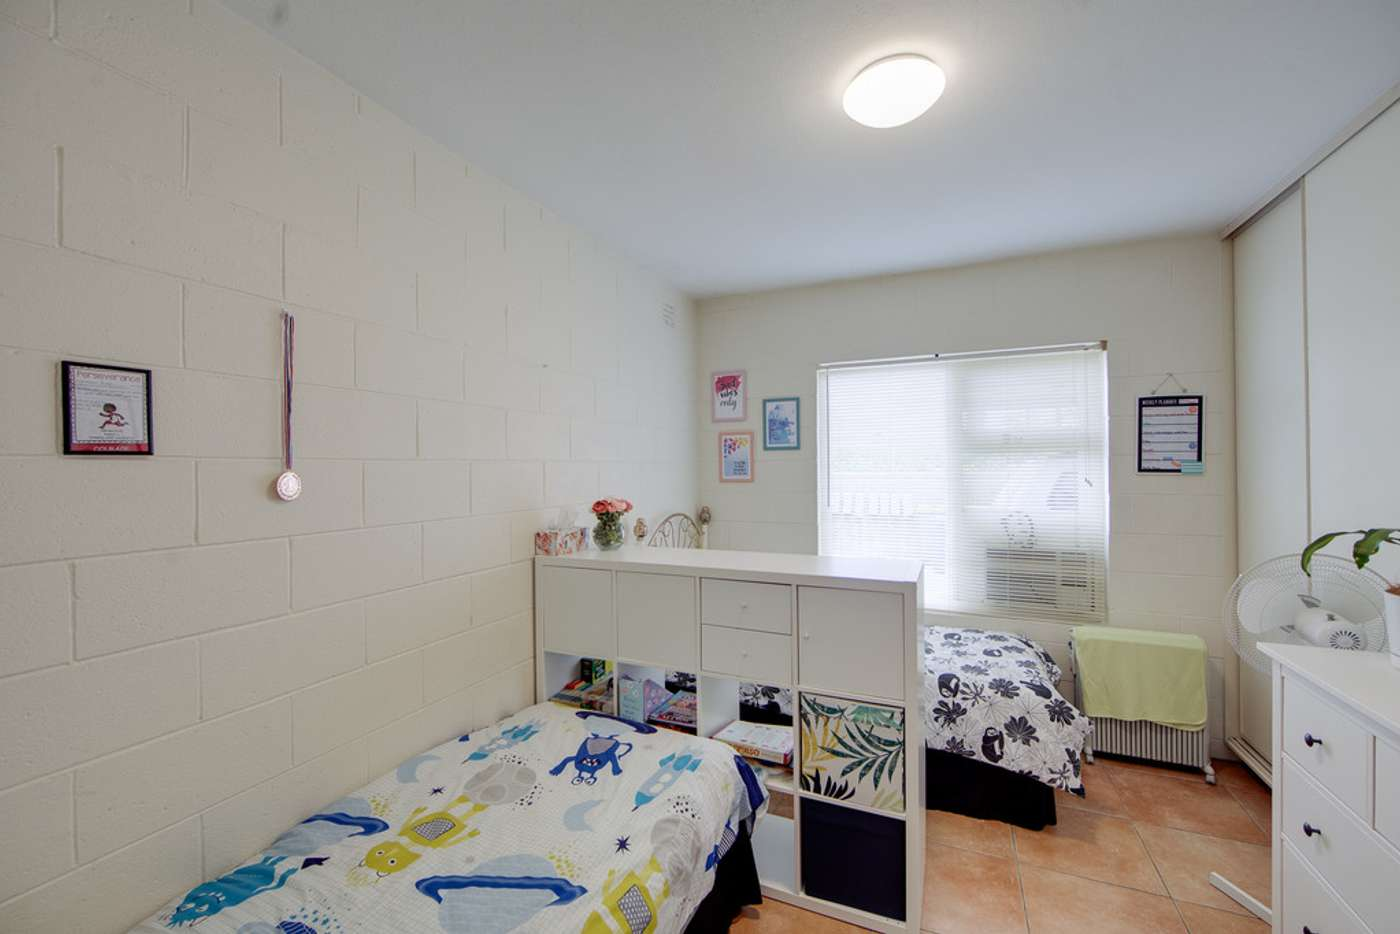 Sixth view of Homely unit listing, 1/49 Duthy Street, Malvern SA 5061